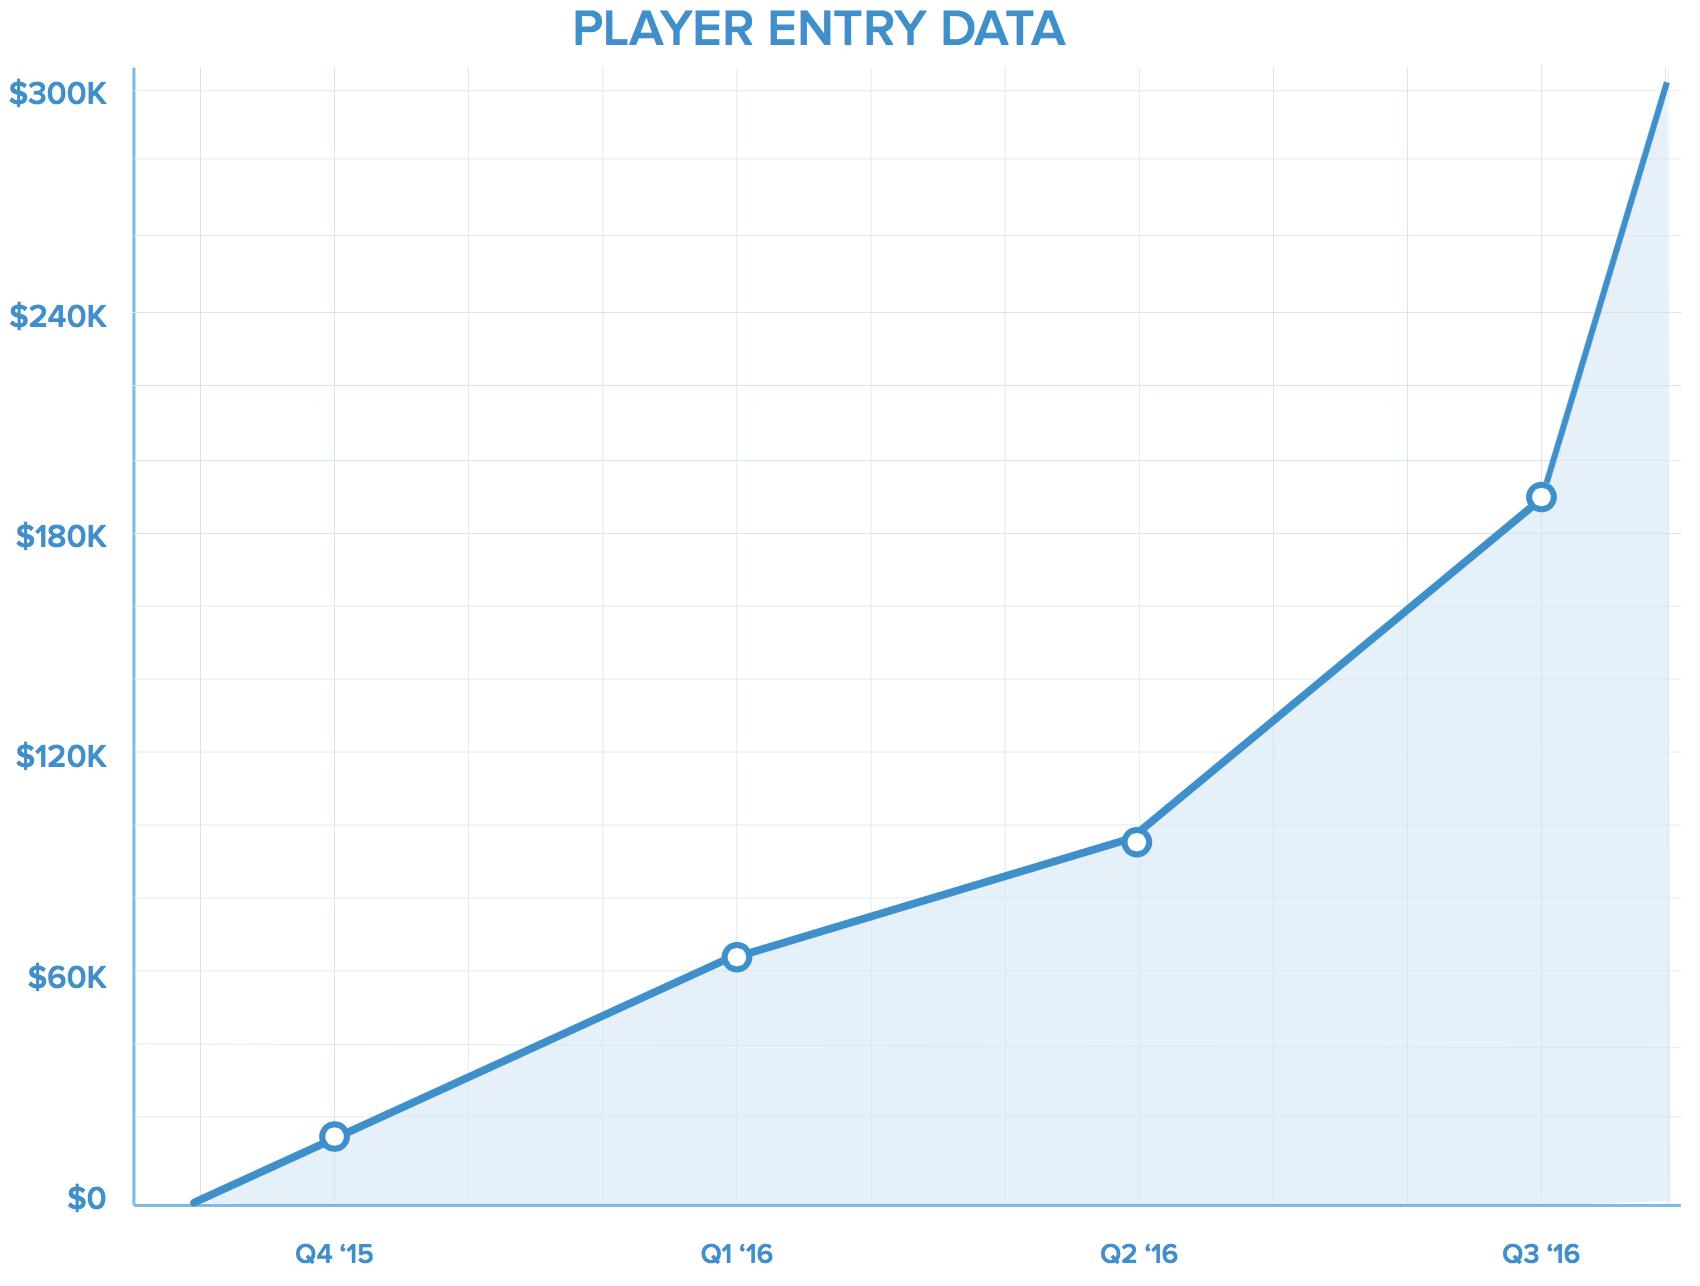 Boom Fantasy data